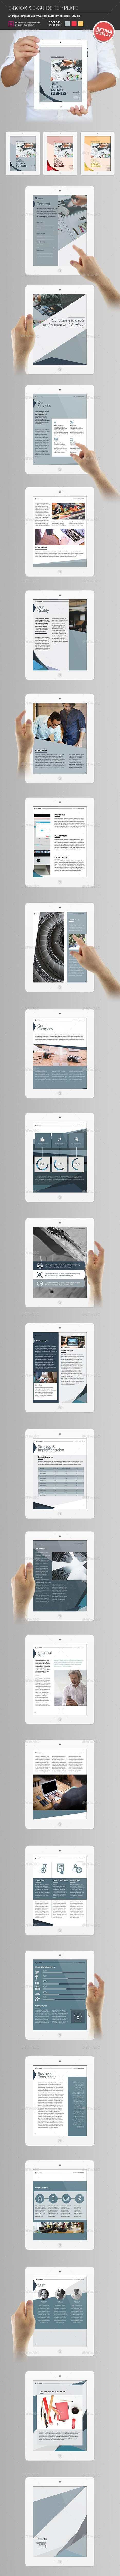 Bad design themen  best marketing digital images on pinterest  editorial design